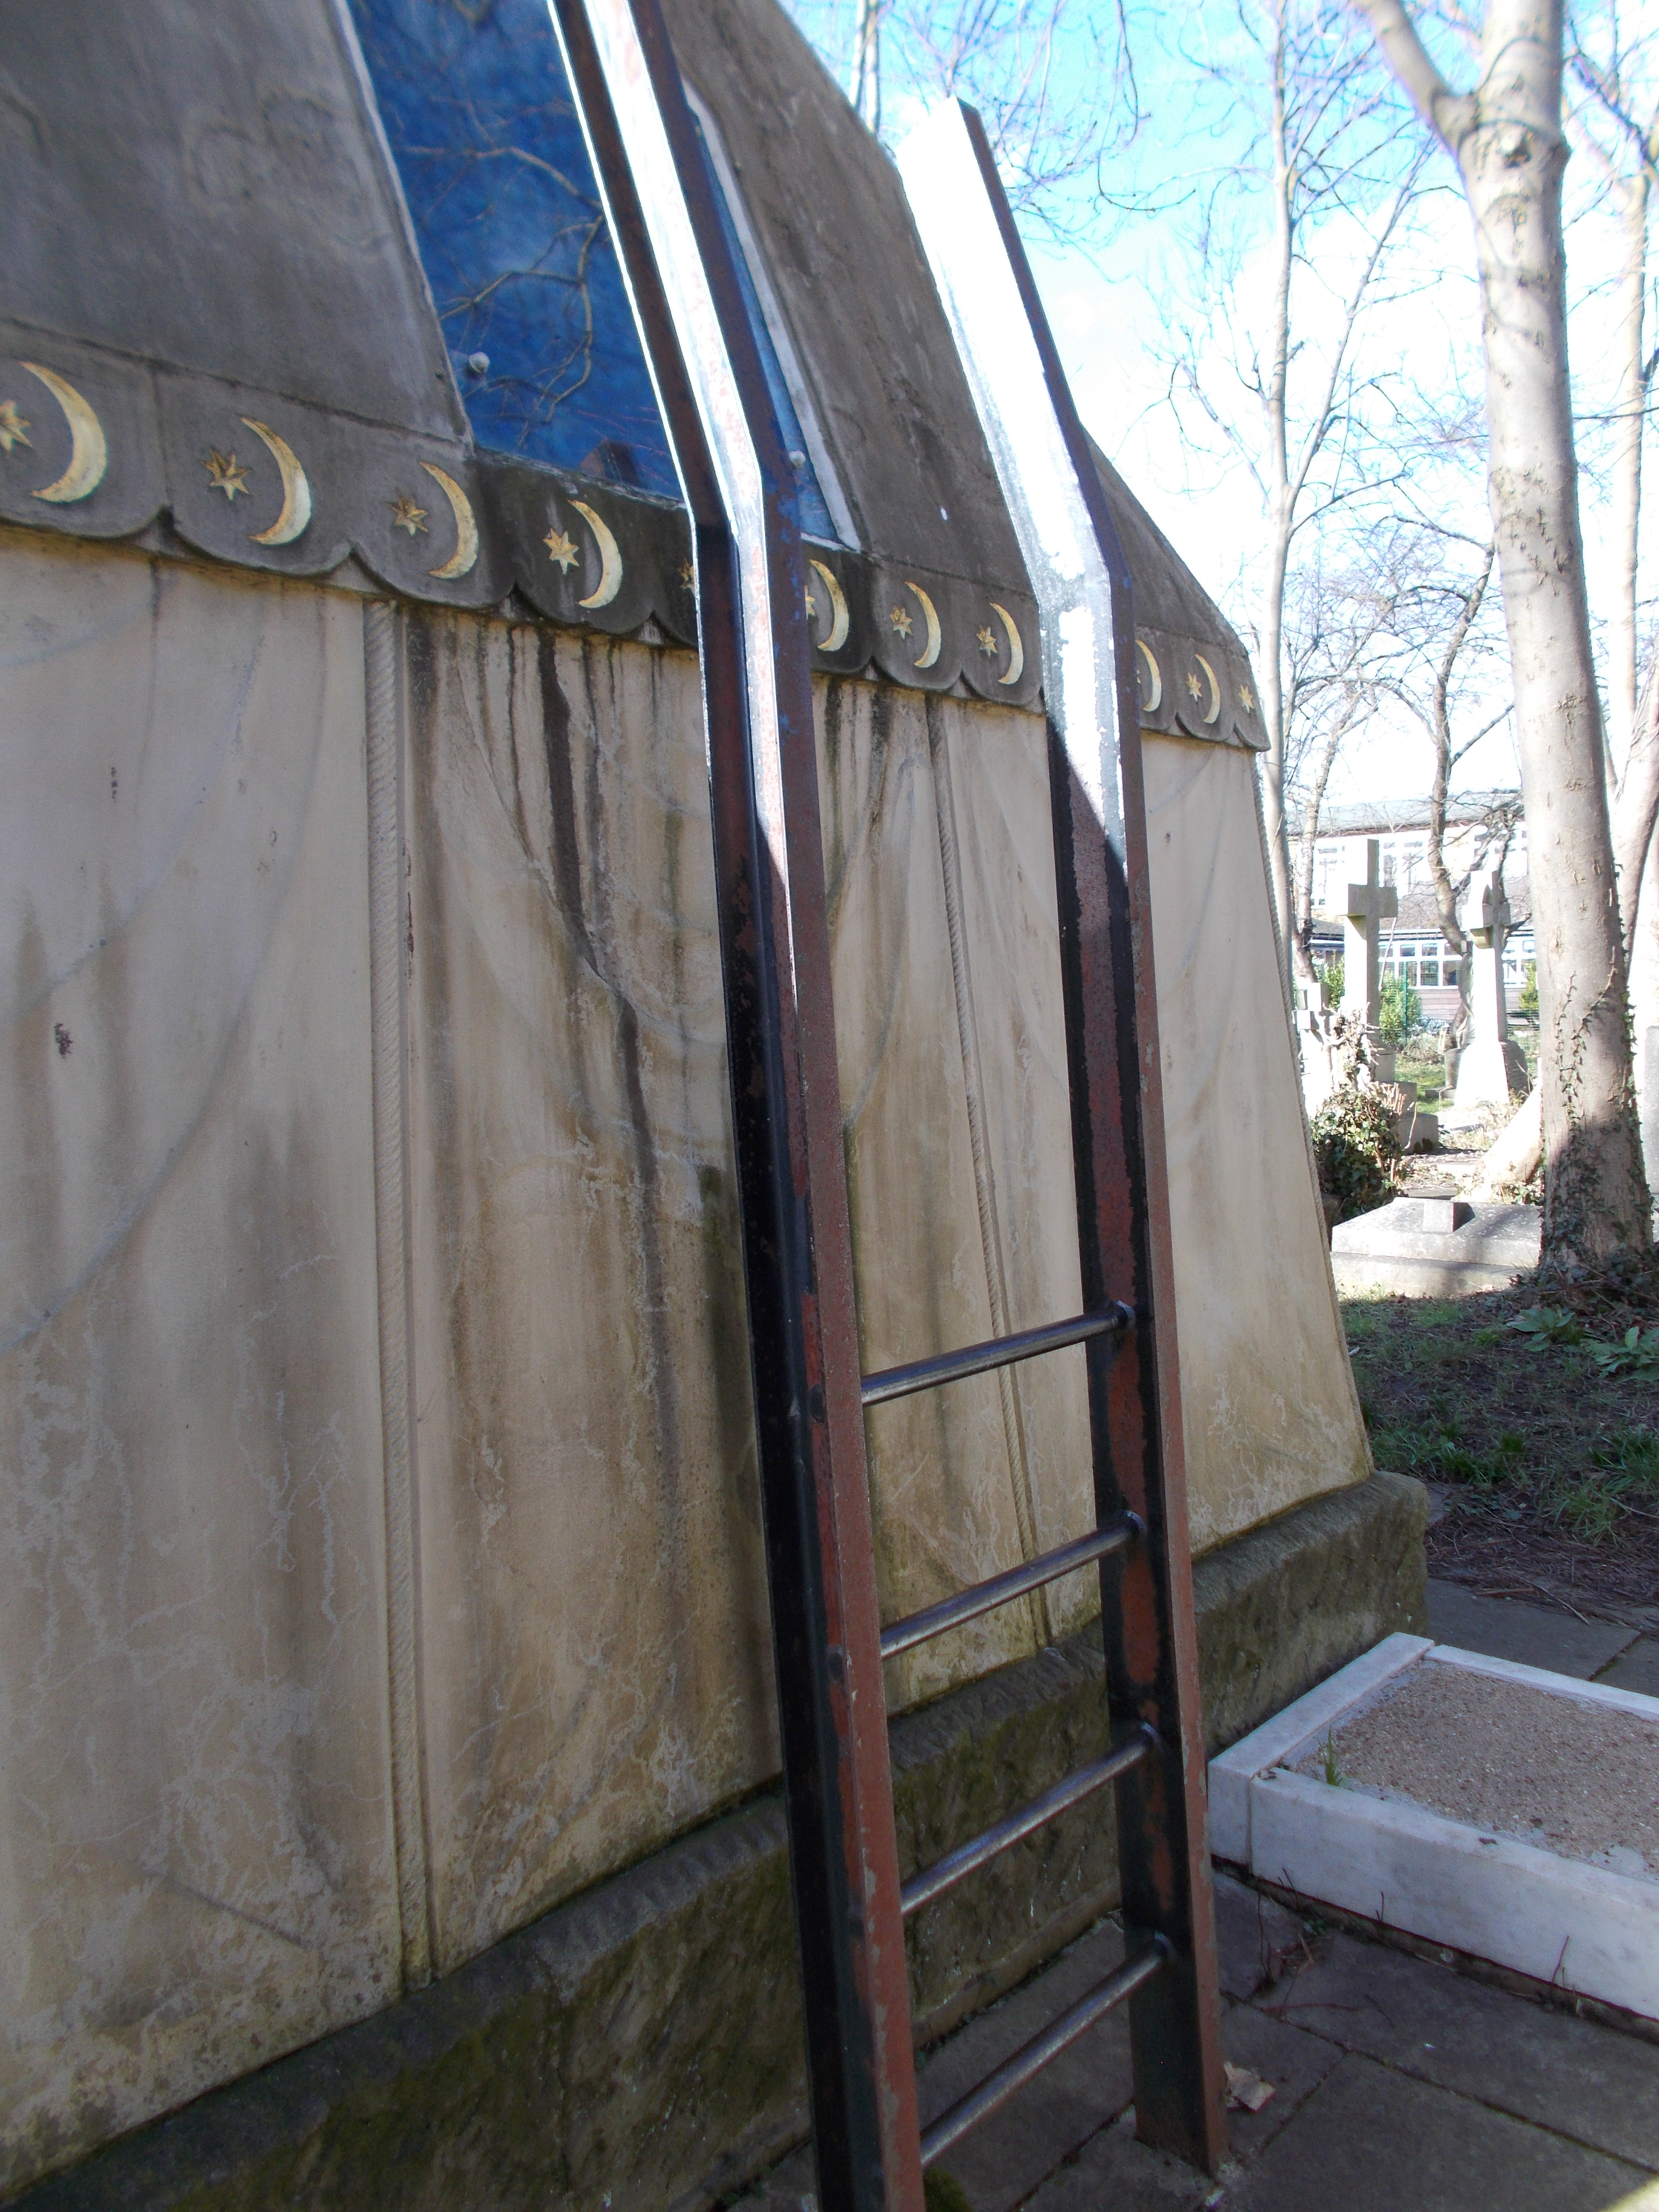 The Burton Mausoleum: an adventurer's tomb in a quiet suburb